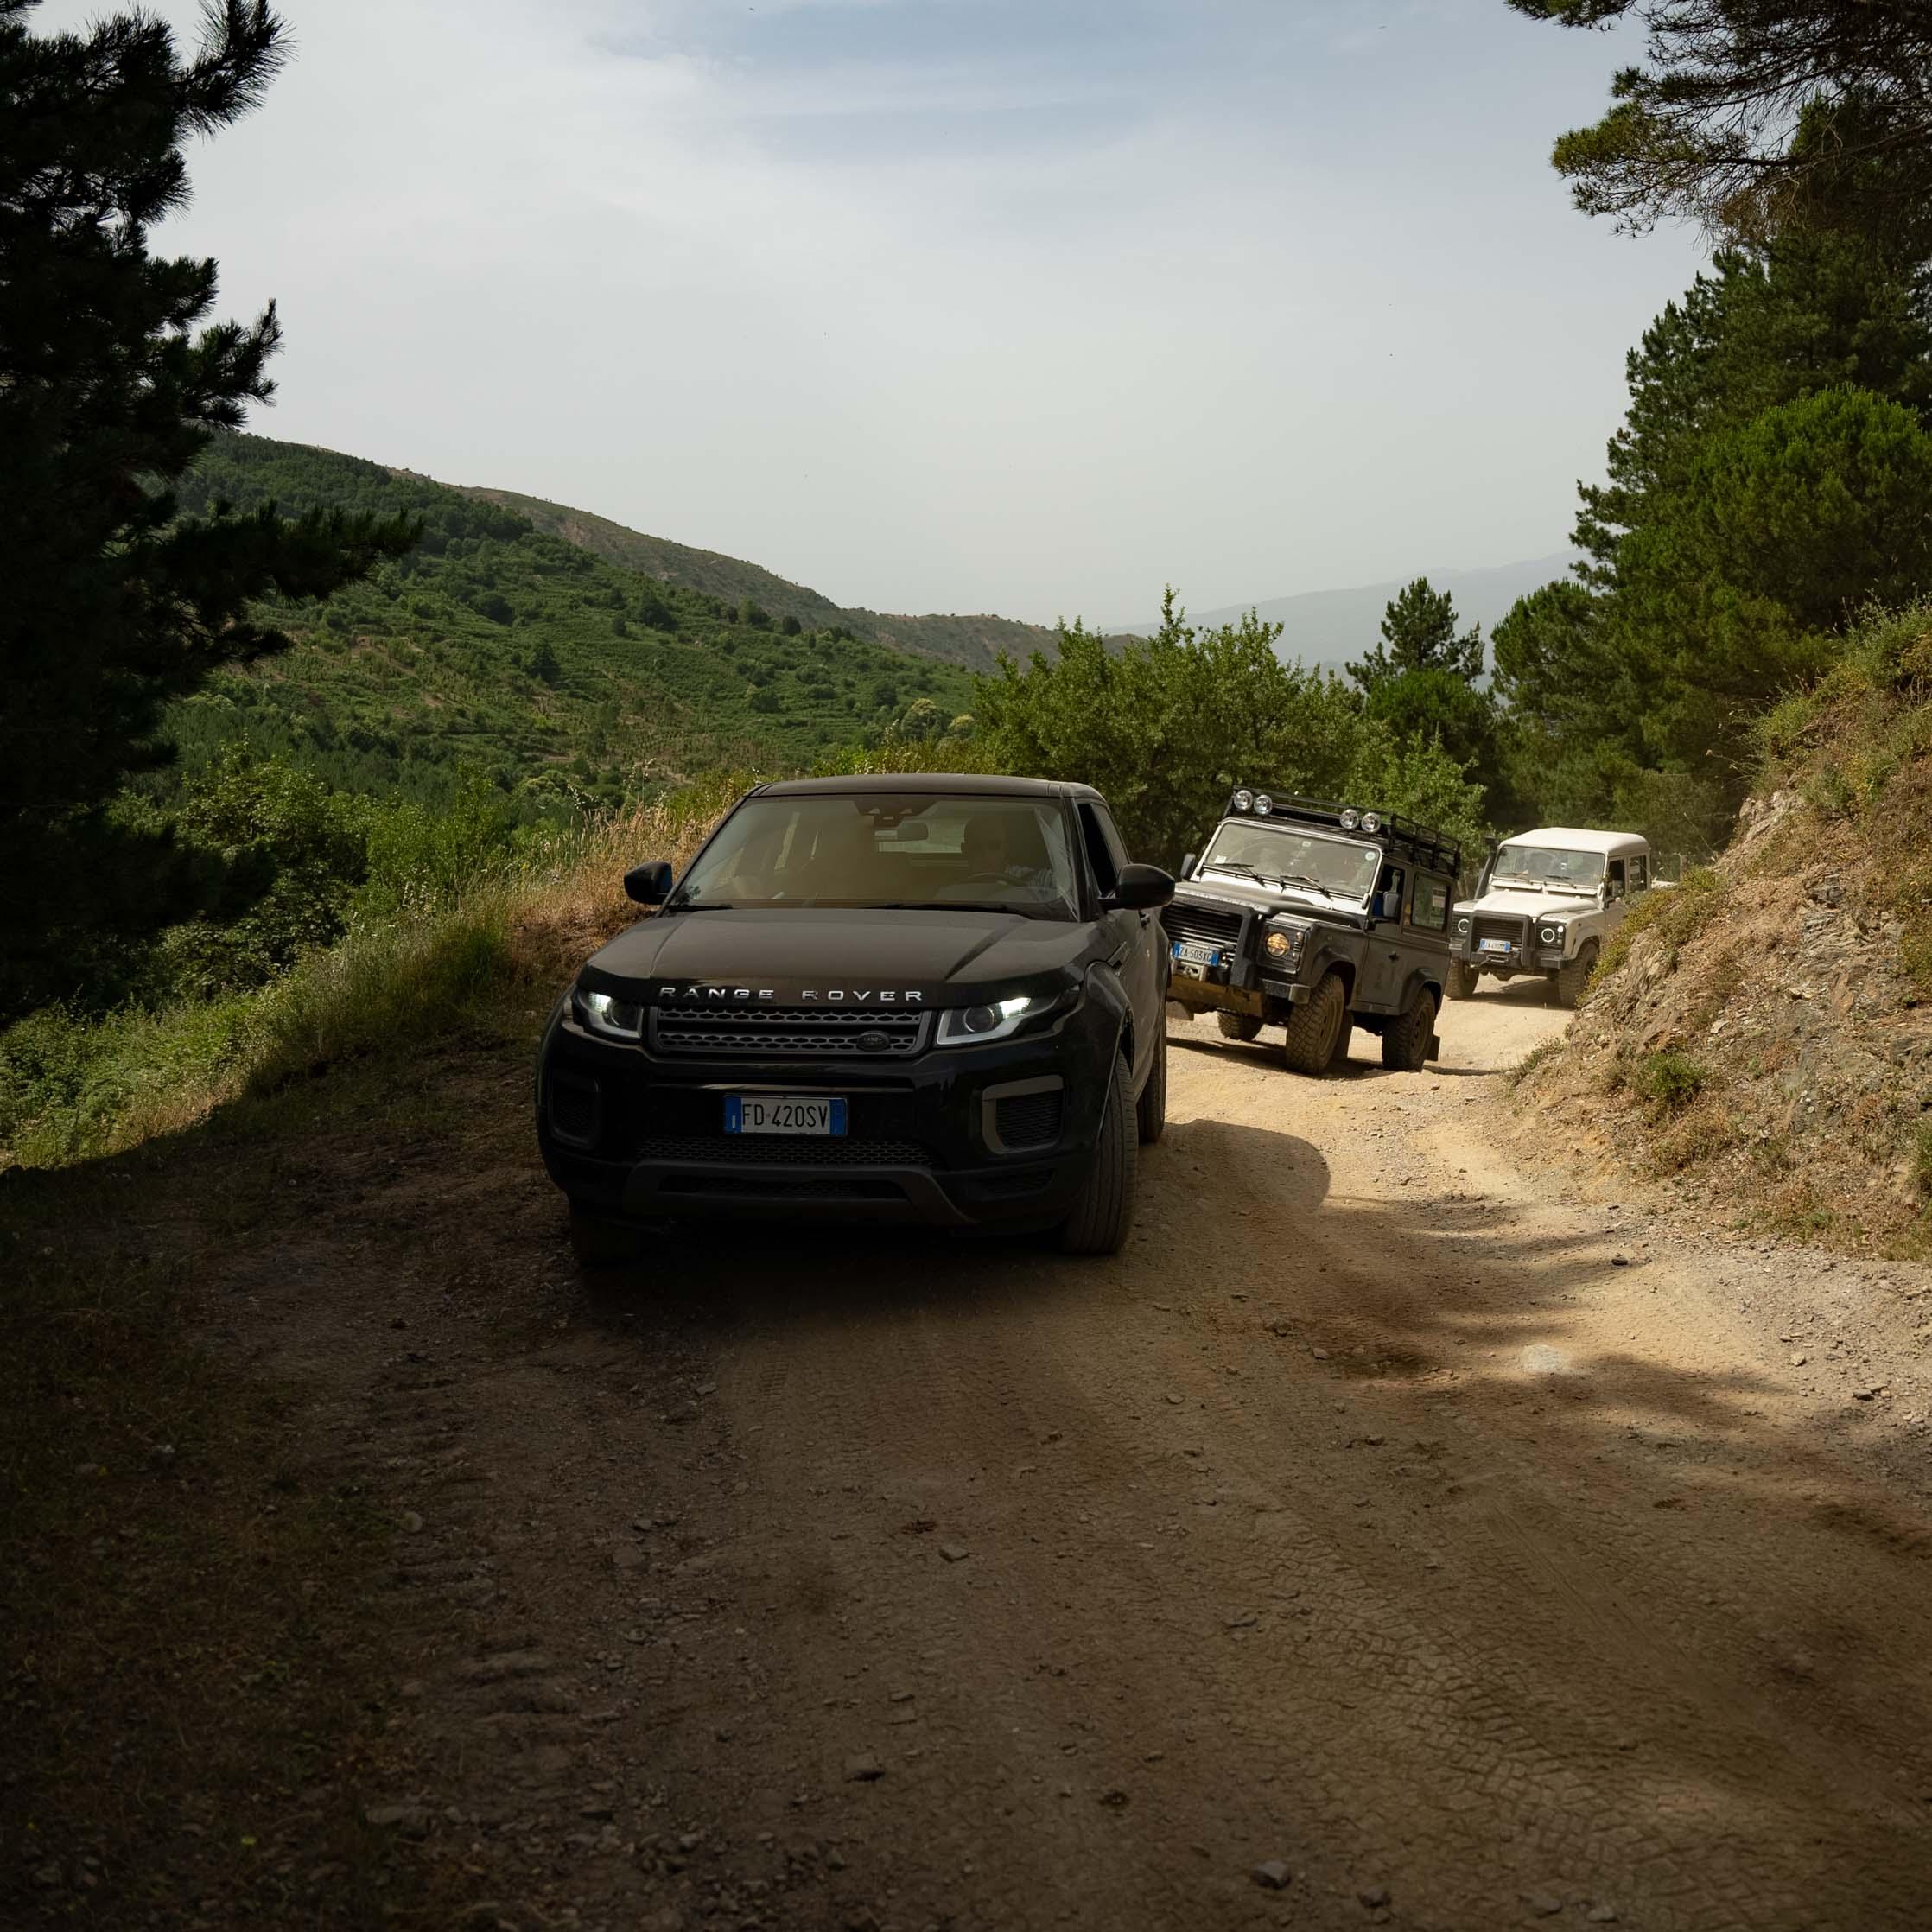 Land_Rover_Tour_Sicilia_2021_Land_Rover_Experience_Italia_-19